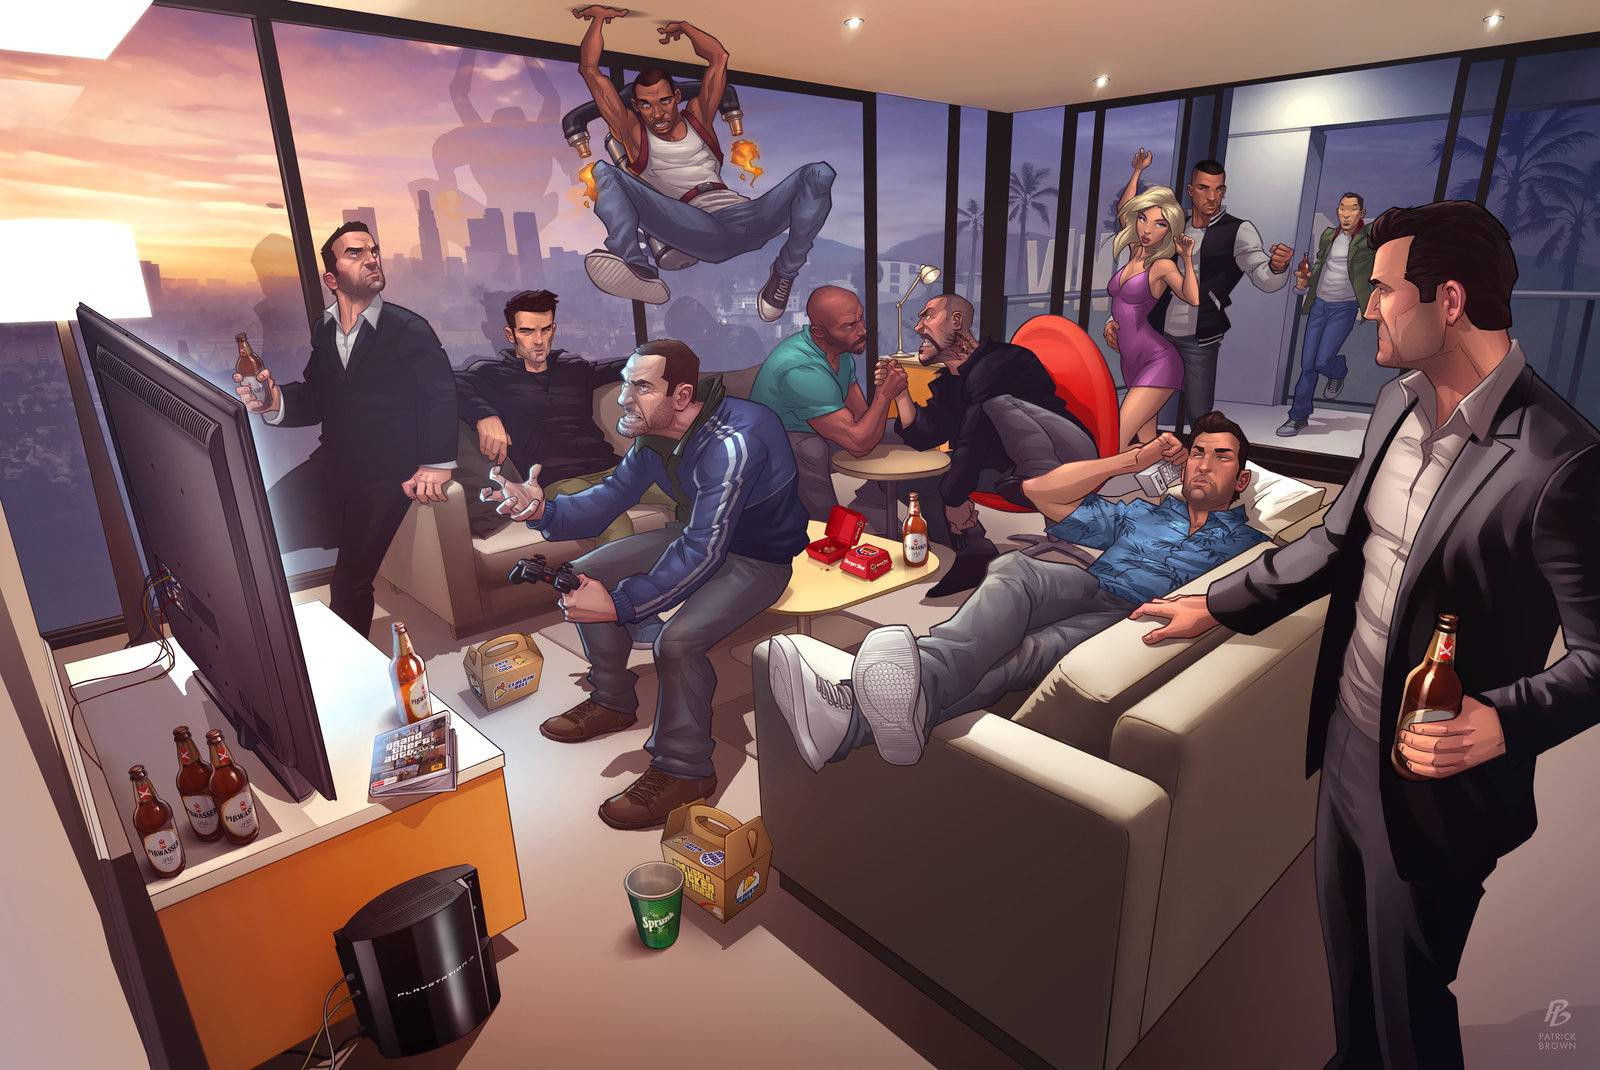 protagoniste de Grand Theft Auto: The Ballad of Gay Tony